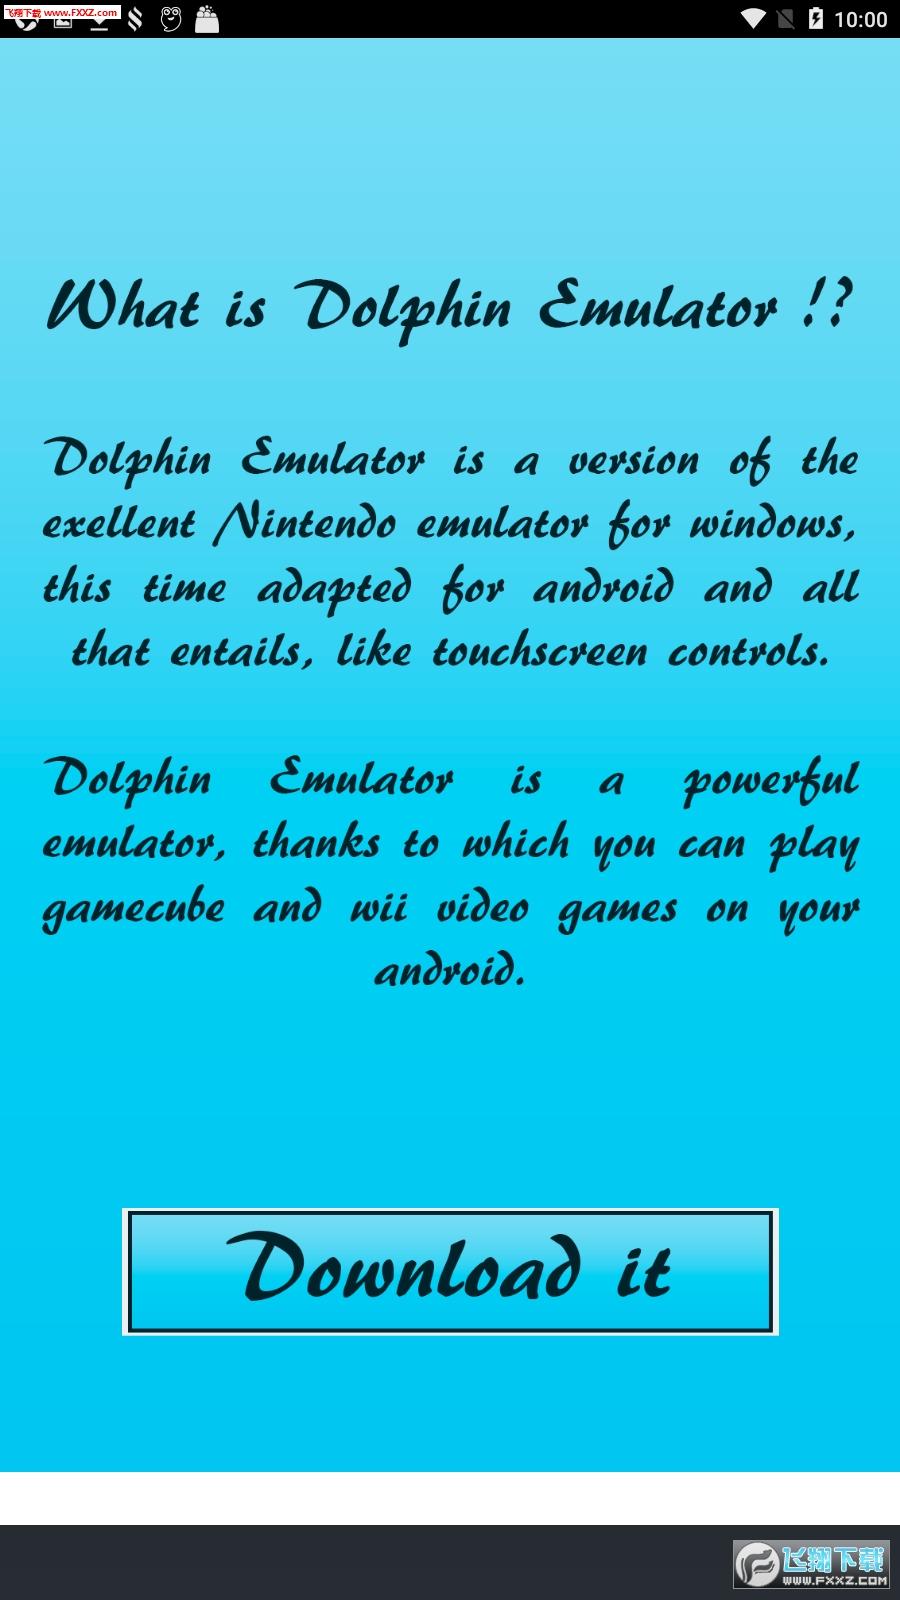 Dolphin Emulator安卓版截图1